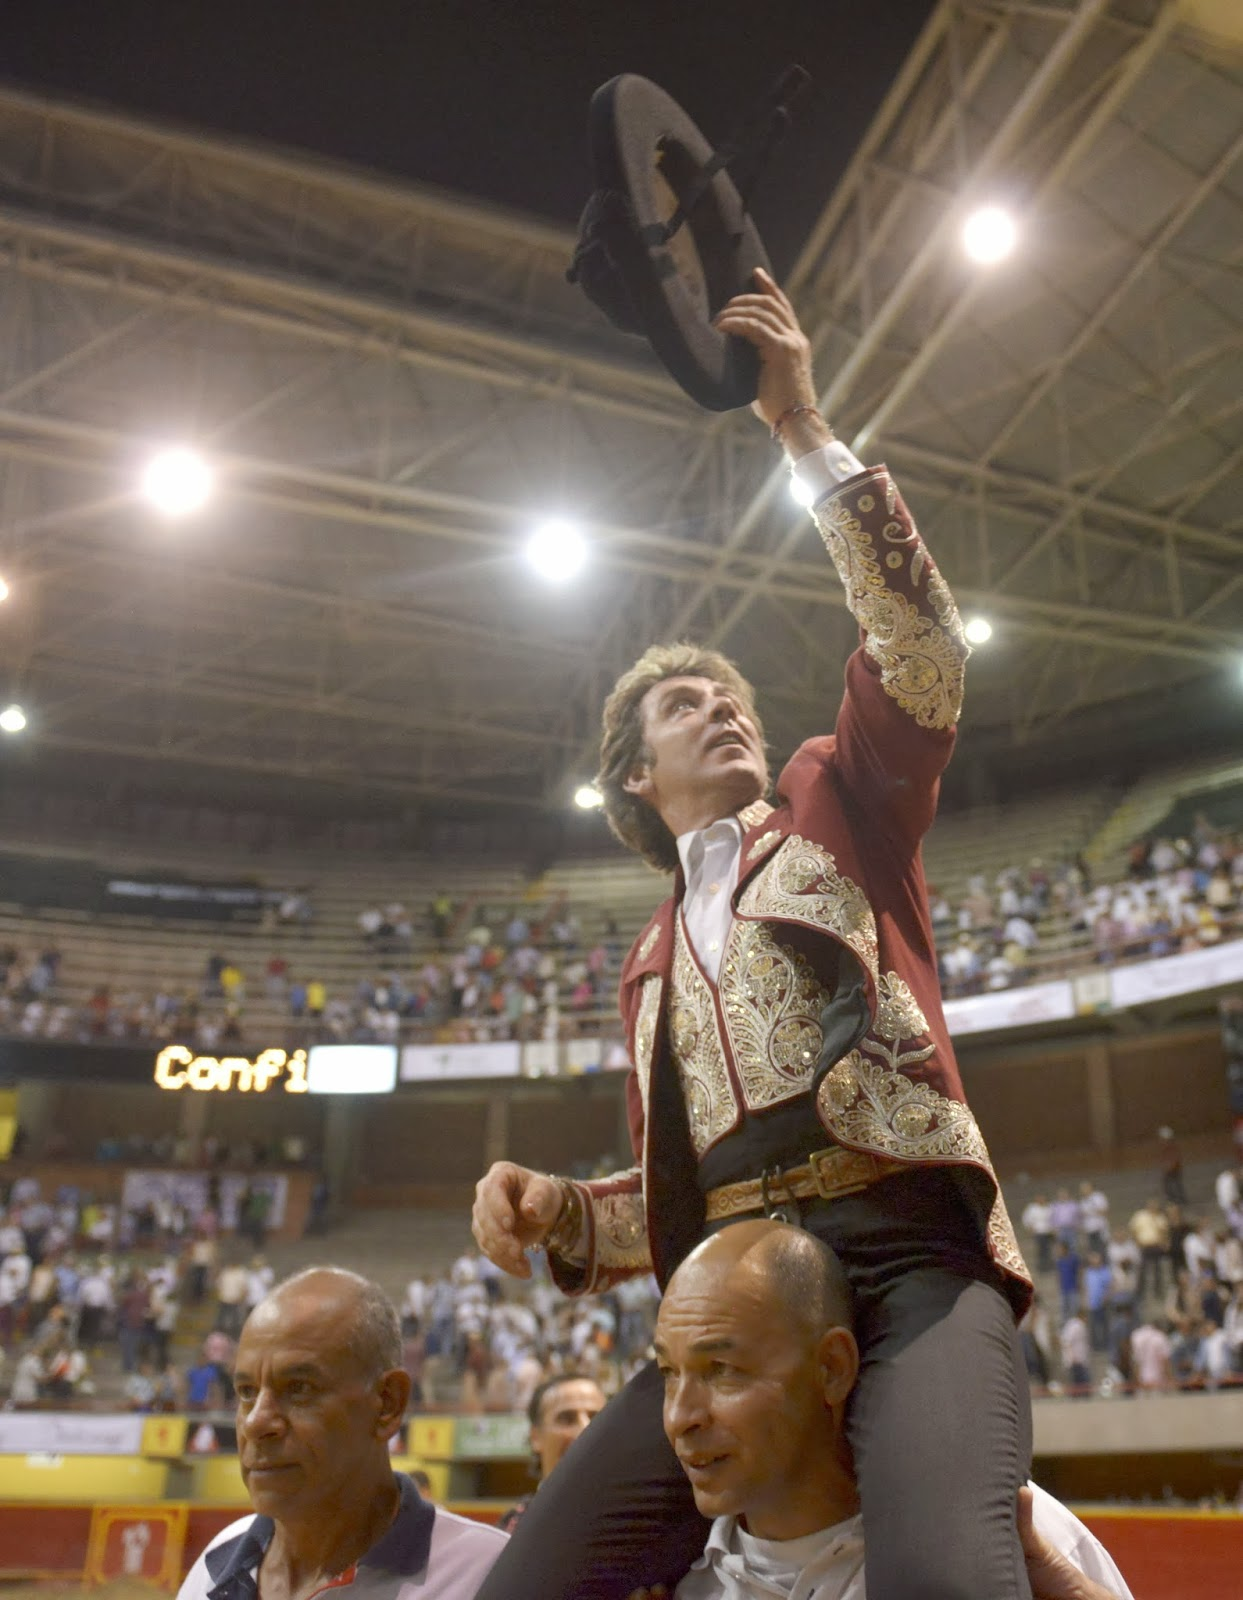 Antioquia, Bull, Bullfighting, Bullring, Celebrate, Colombia, Cut, Deparment, Ears, La Macarena, Medellin, Mounted, Pablo Hermoso de Mendoza, Perform, Spain, Spanish, Sports,